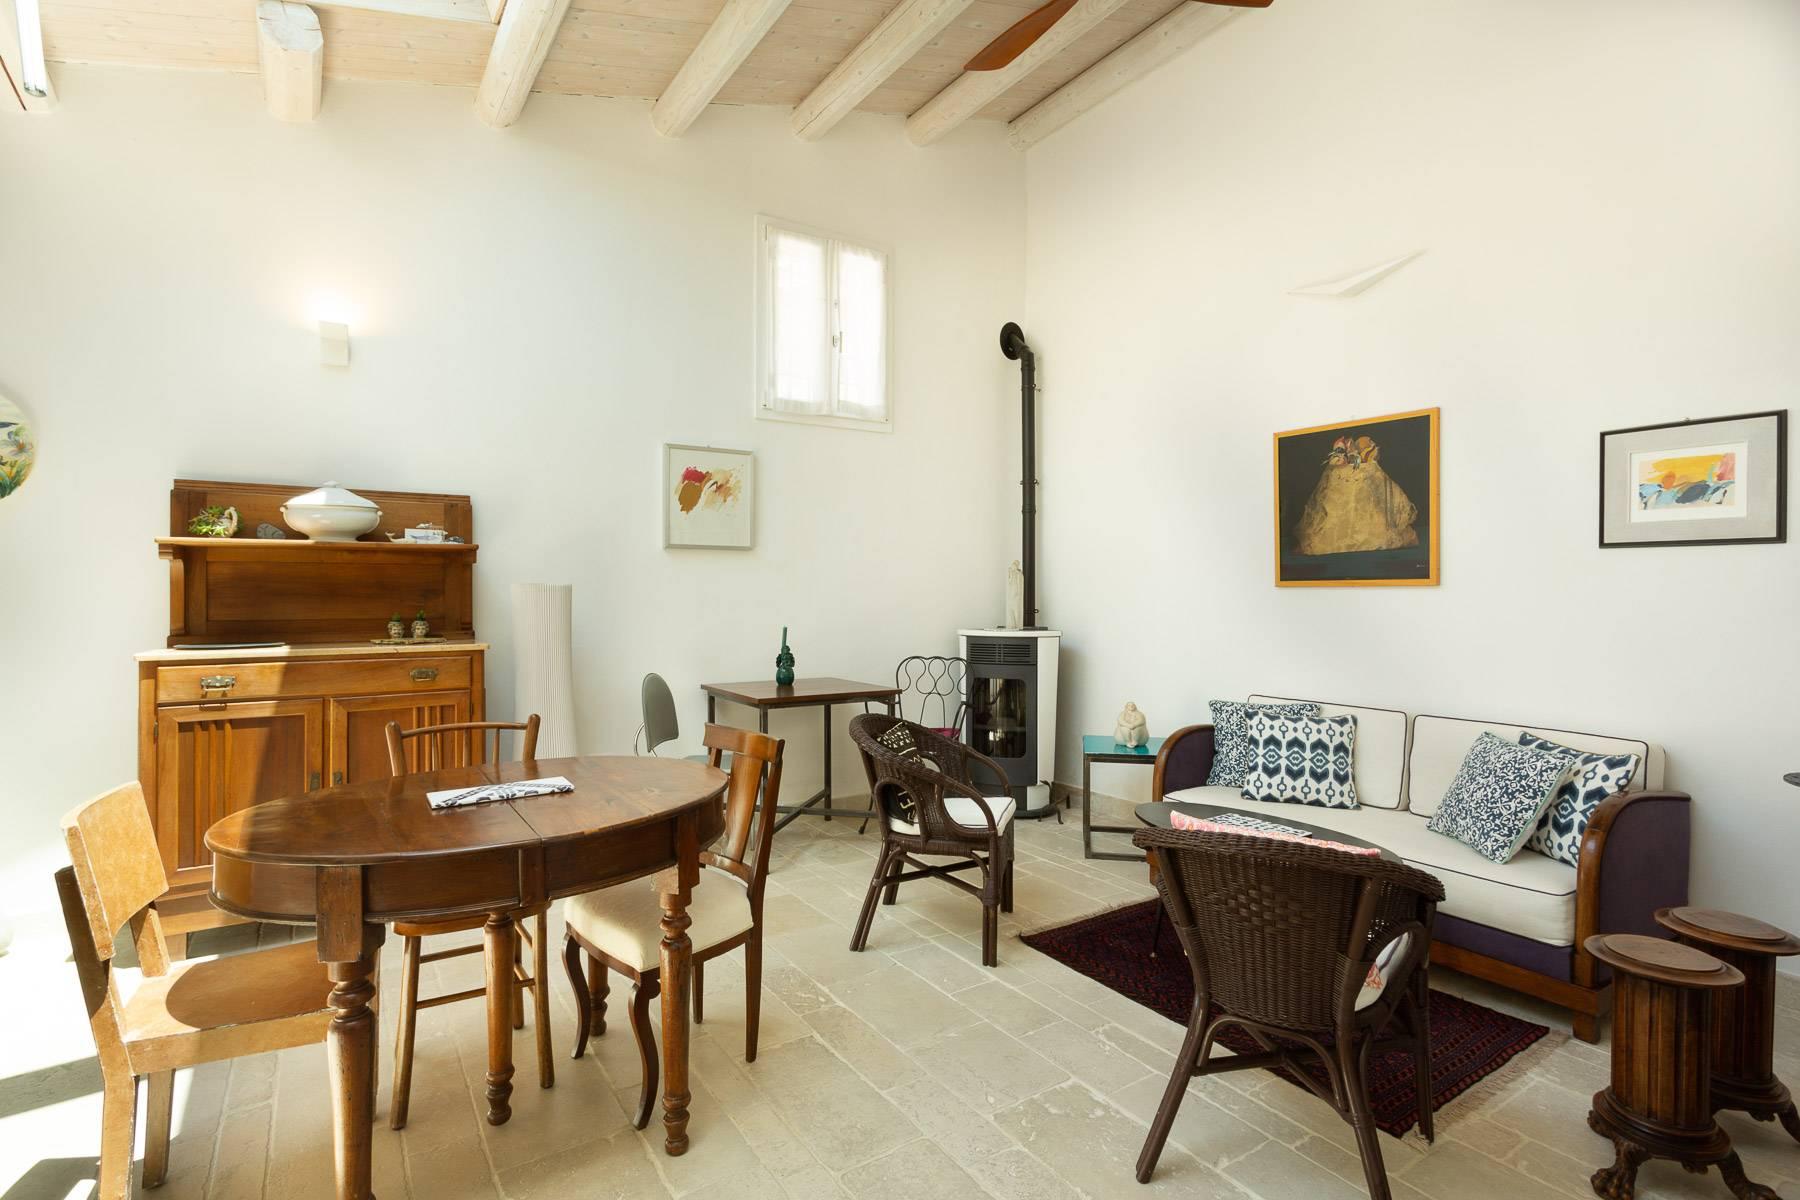 Casa indipendente in Vendita a Noto: 5 locali, 171 mq - Foto 14